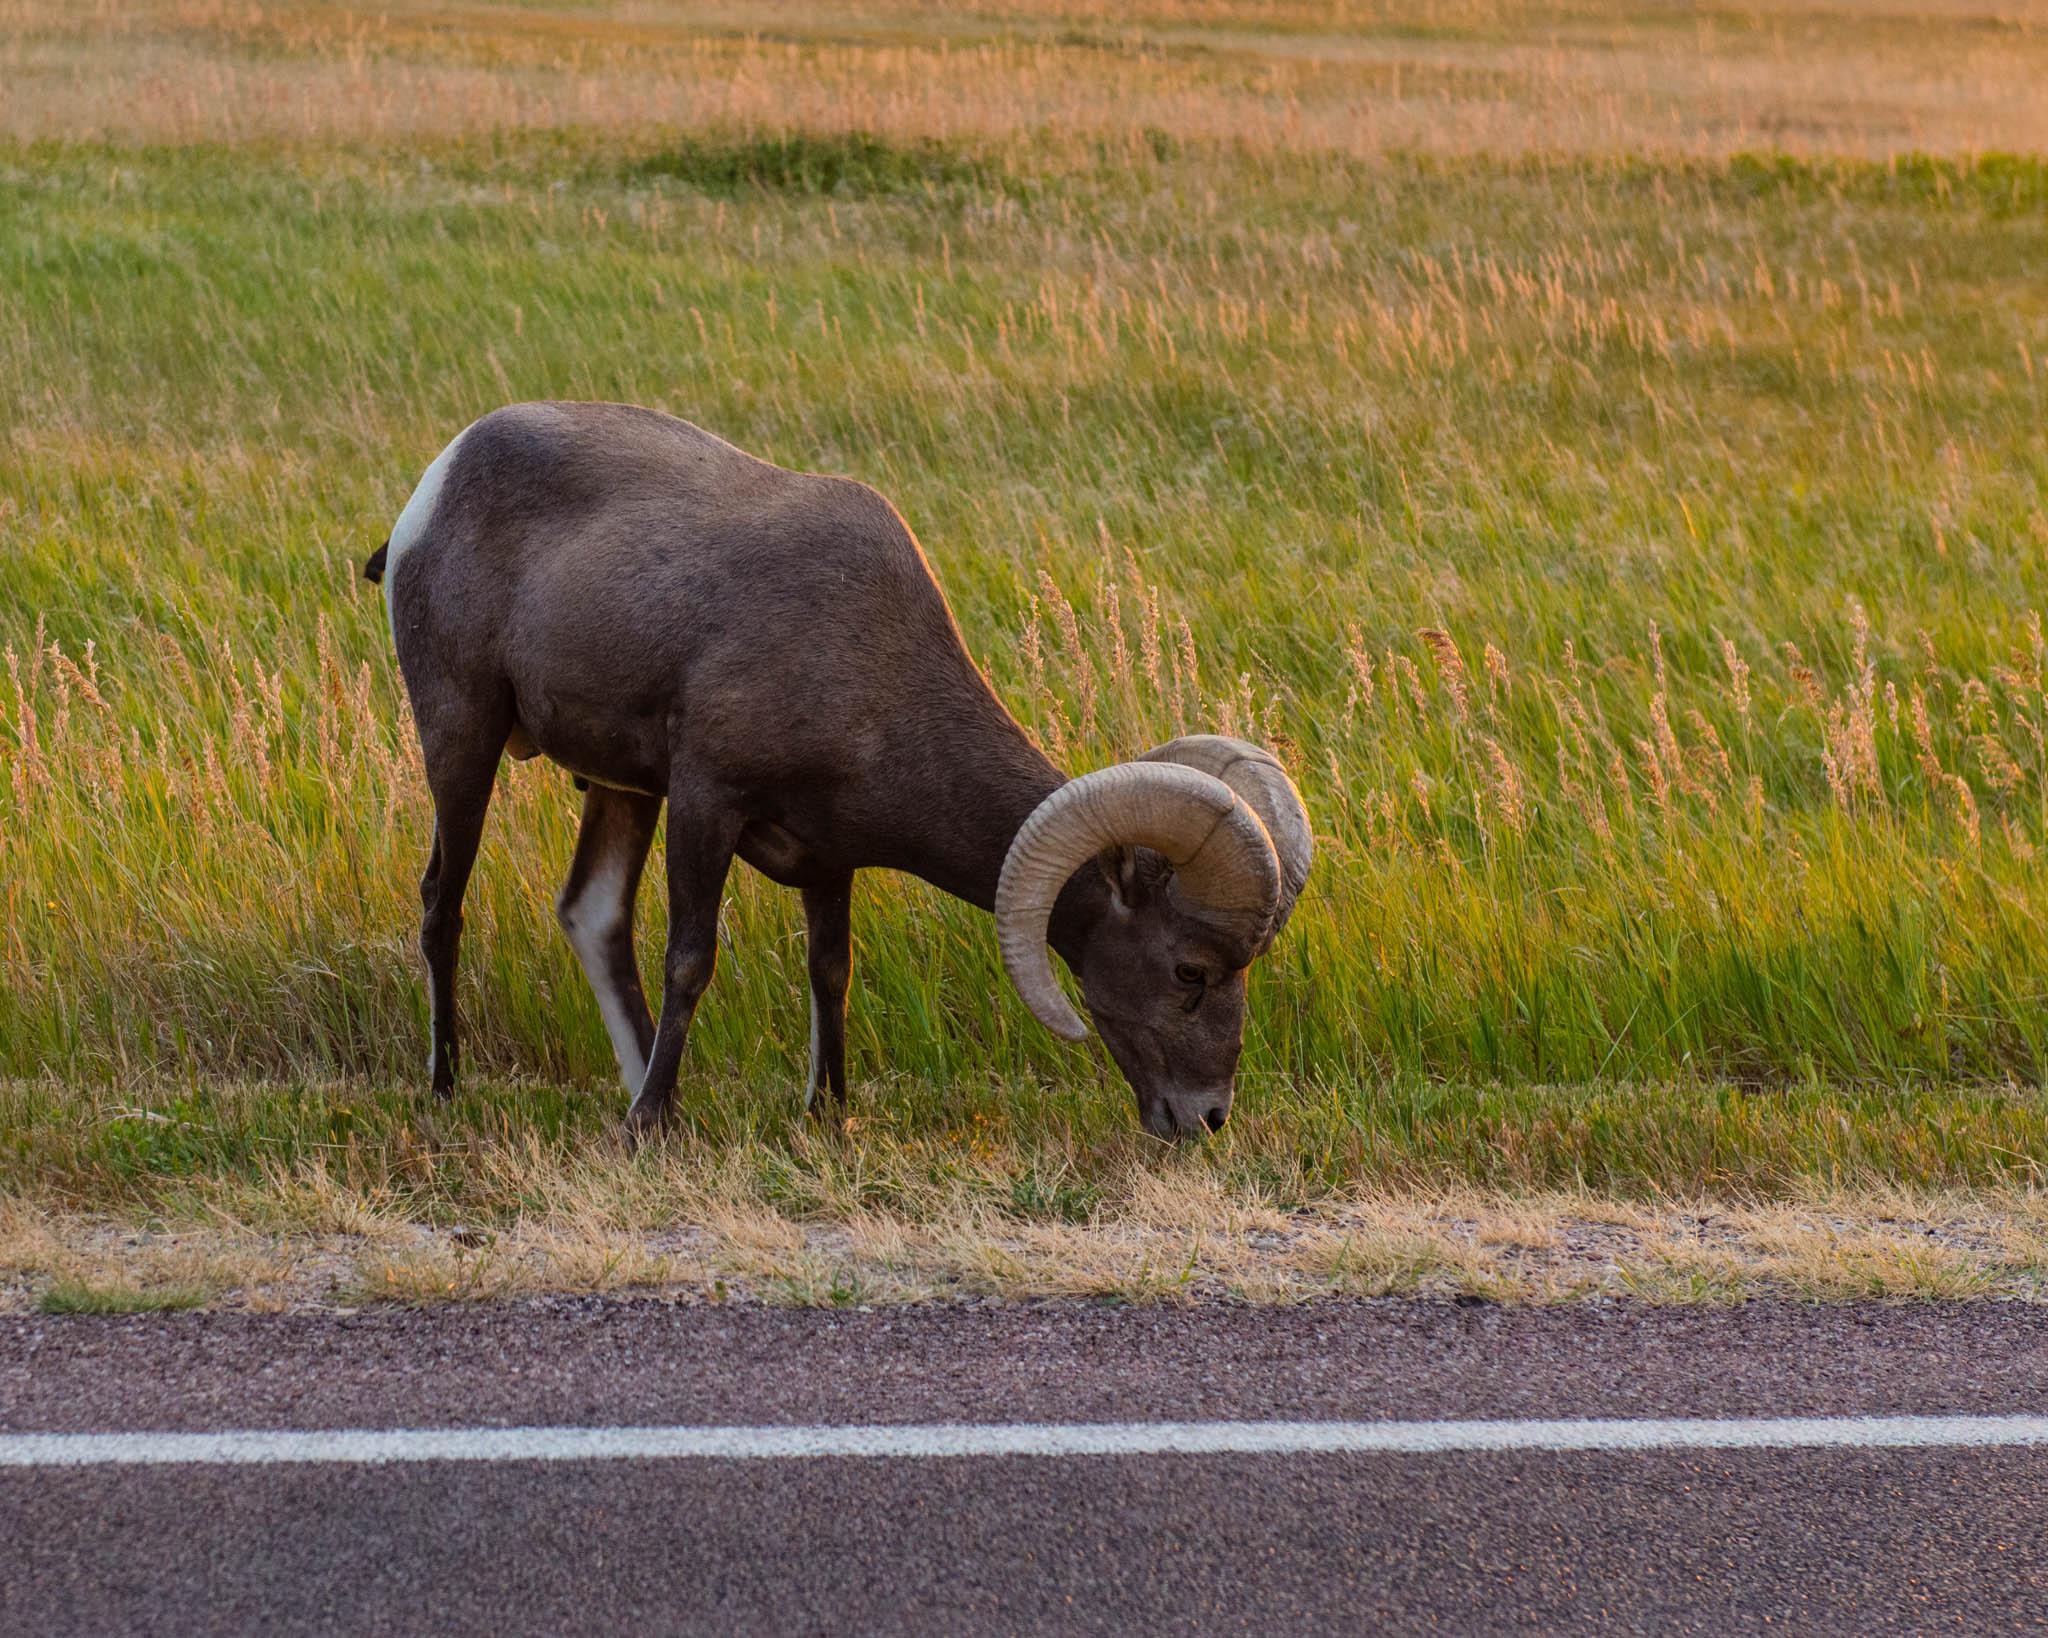 Big-horned sheep!